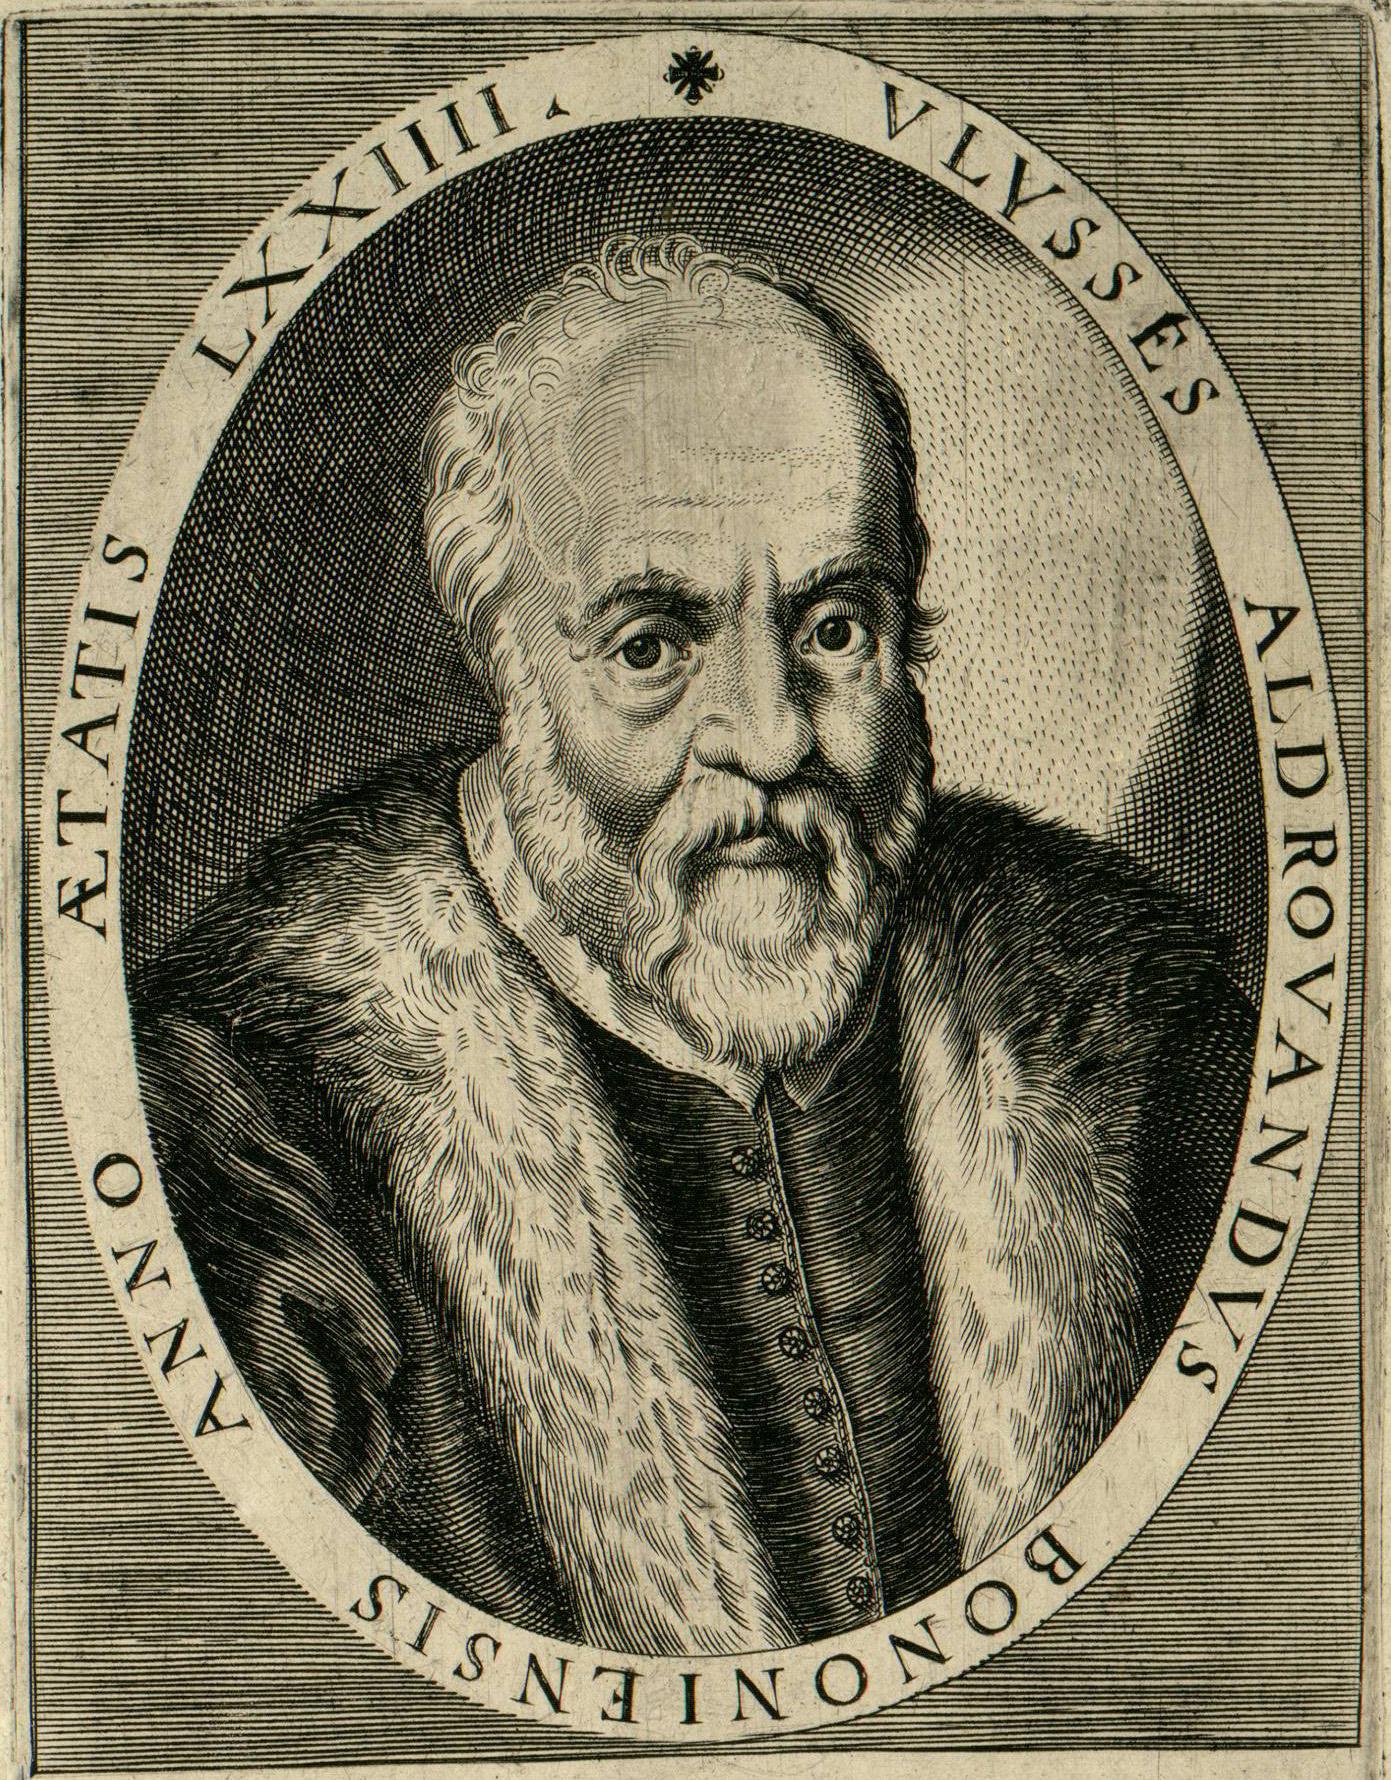 Depiction of Ulisse Aldrovandi